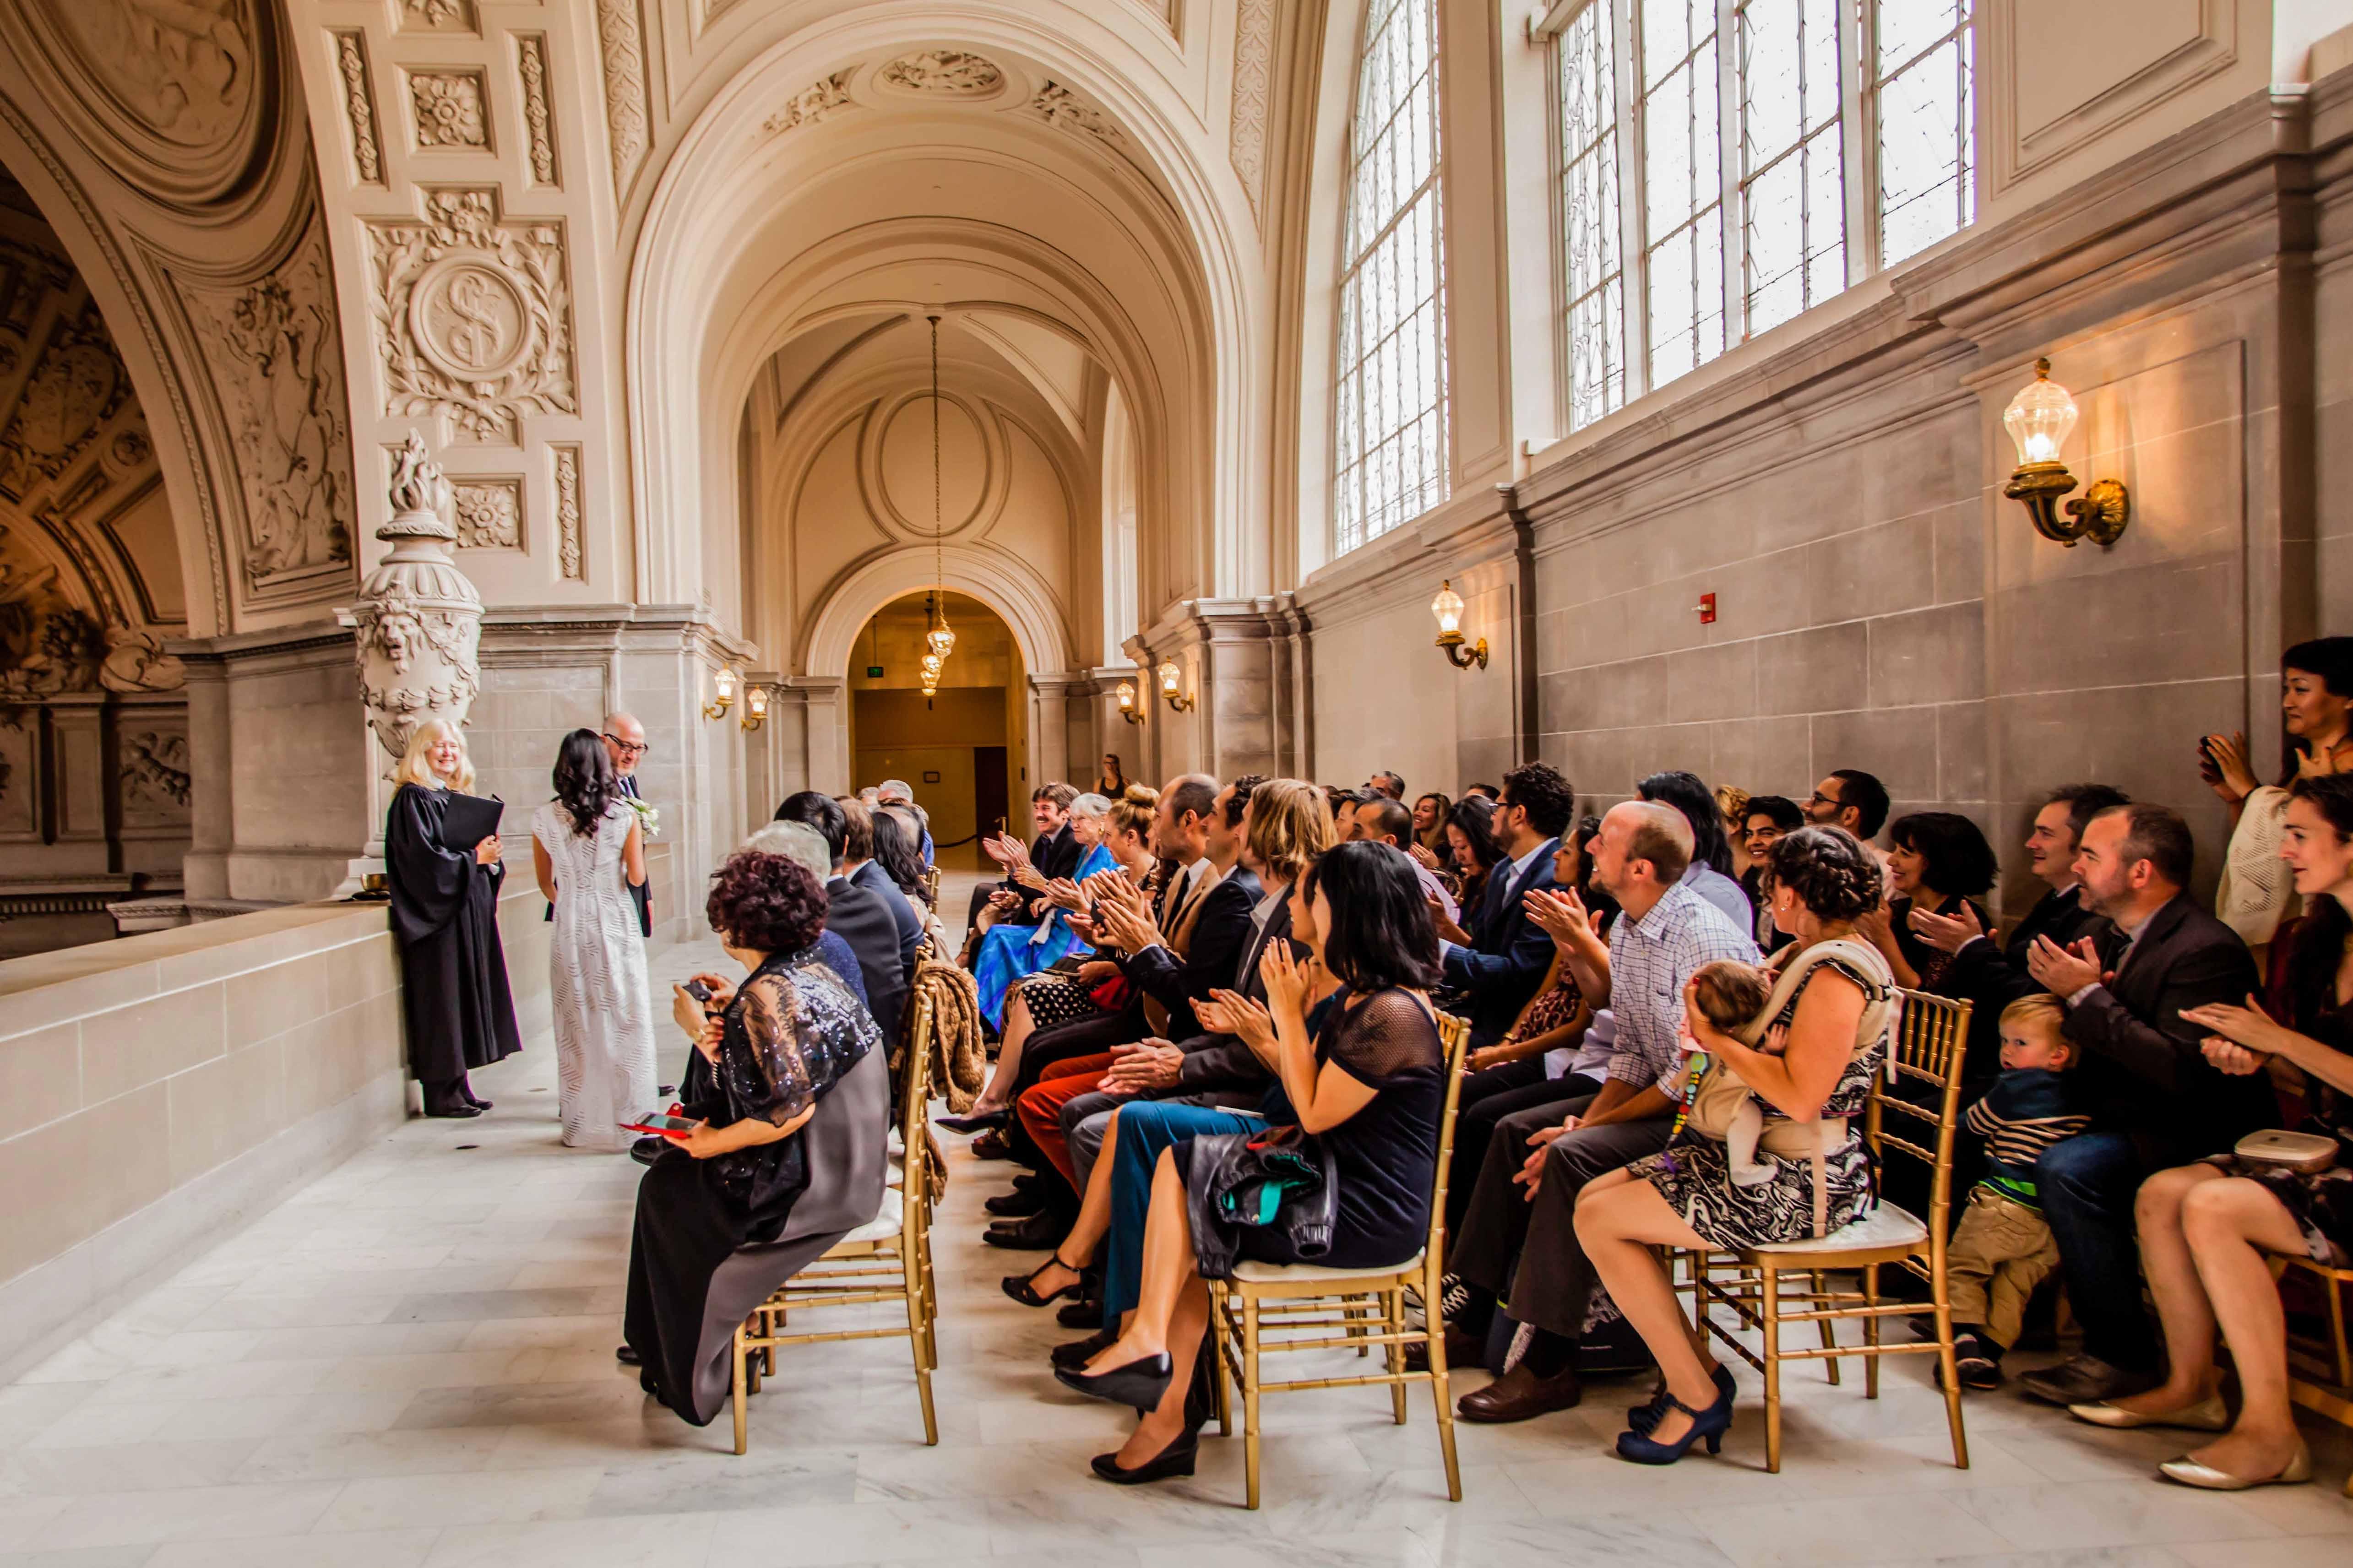 San francisco city hall wedding calmax studio for Sf courthouse wedding